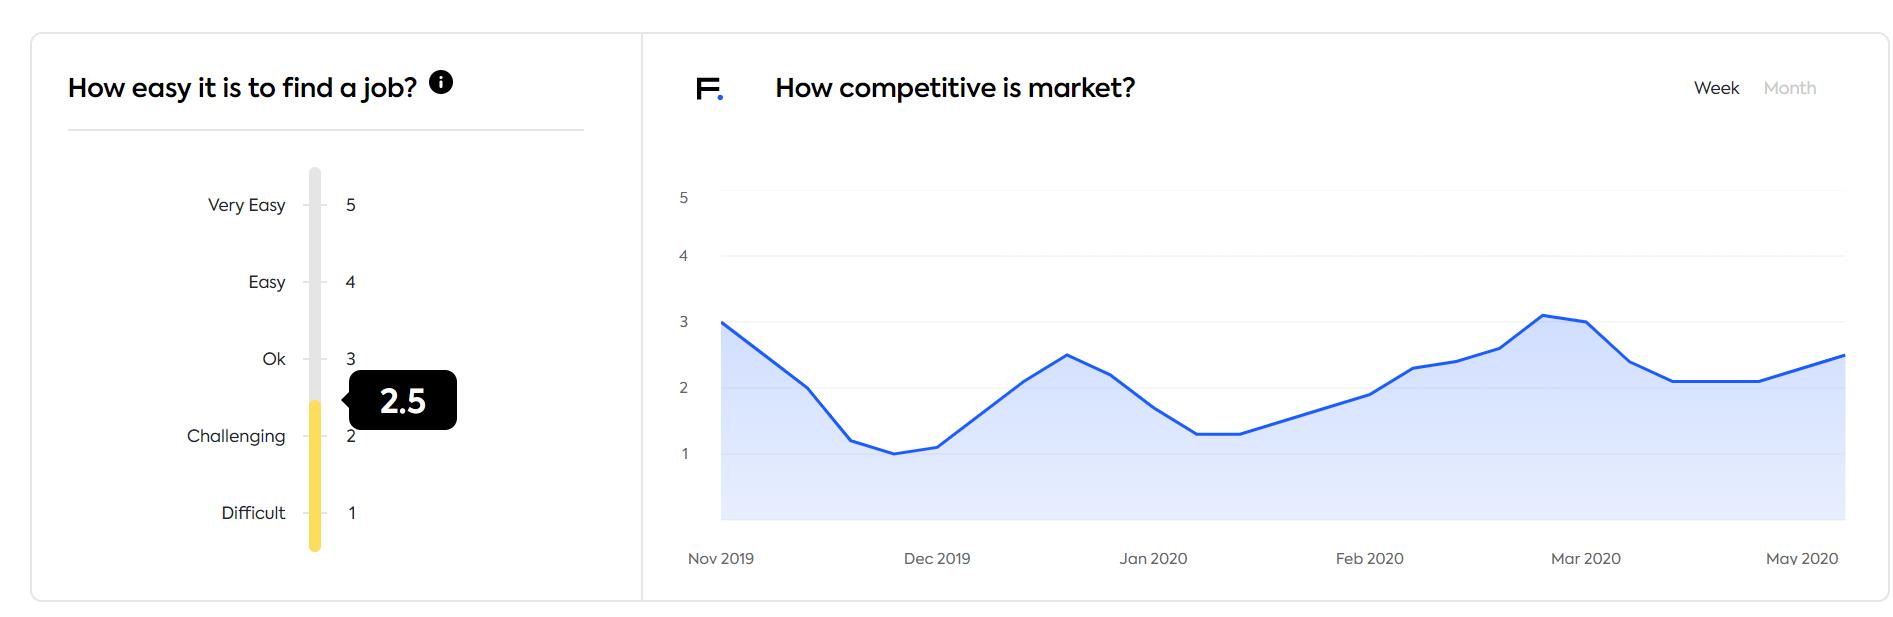 Finnish market competitiveness in marketing & pr & media